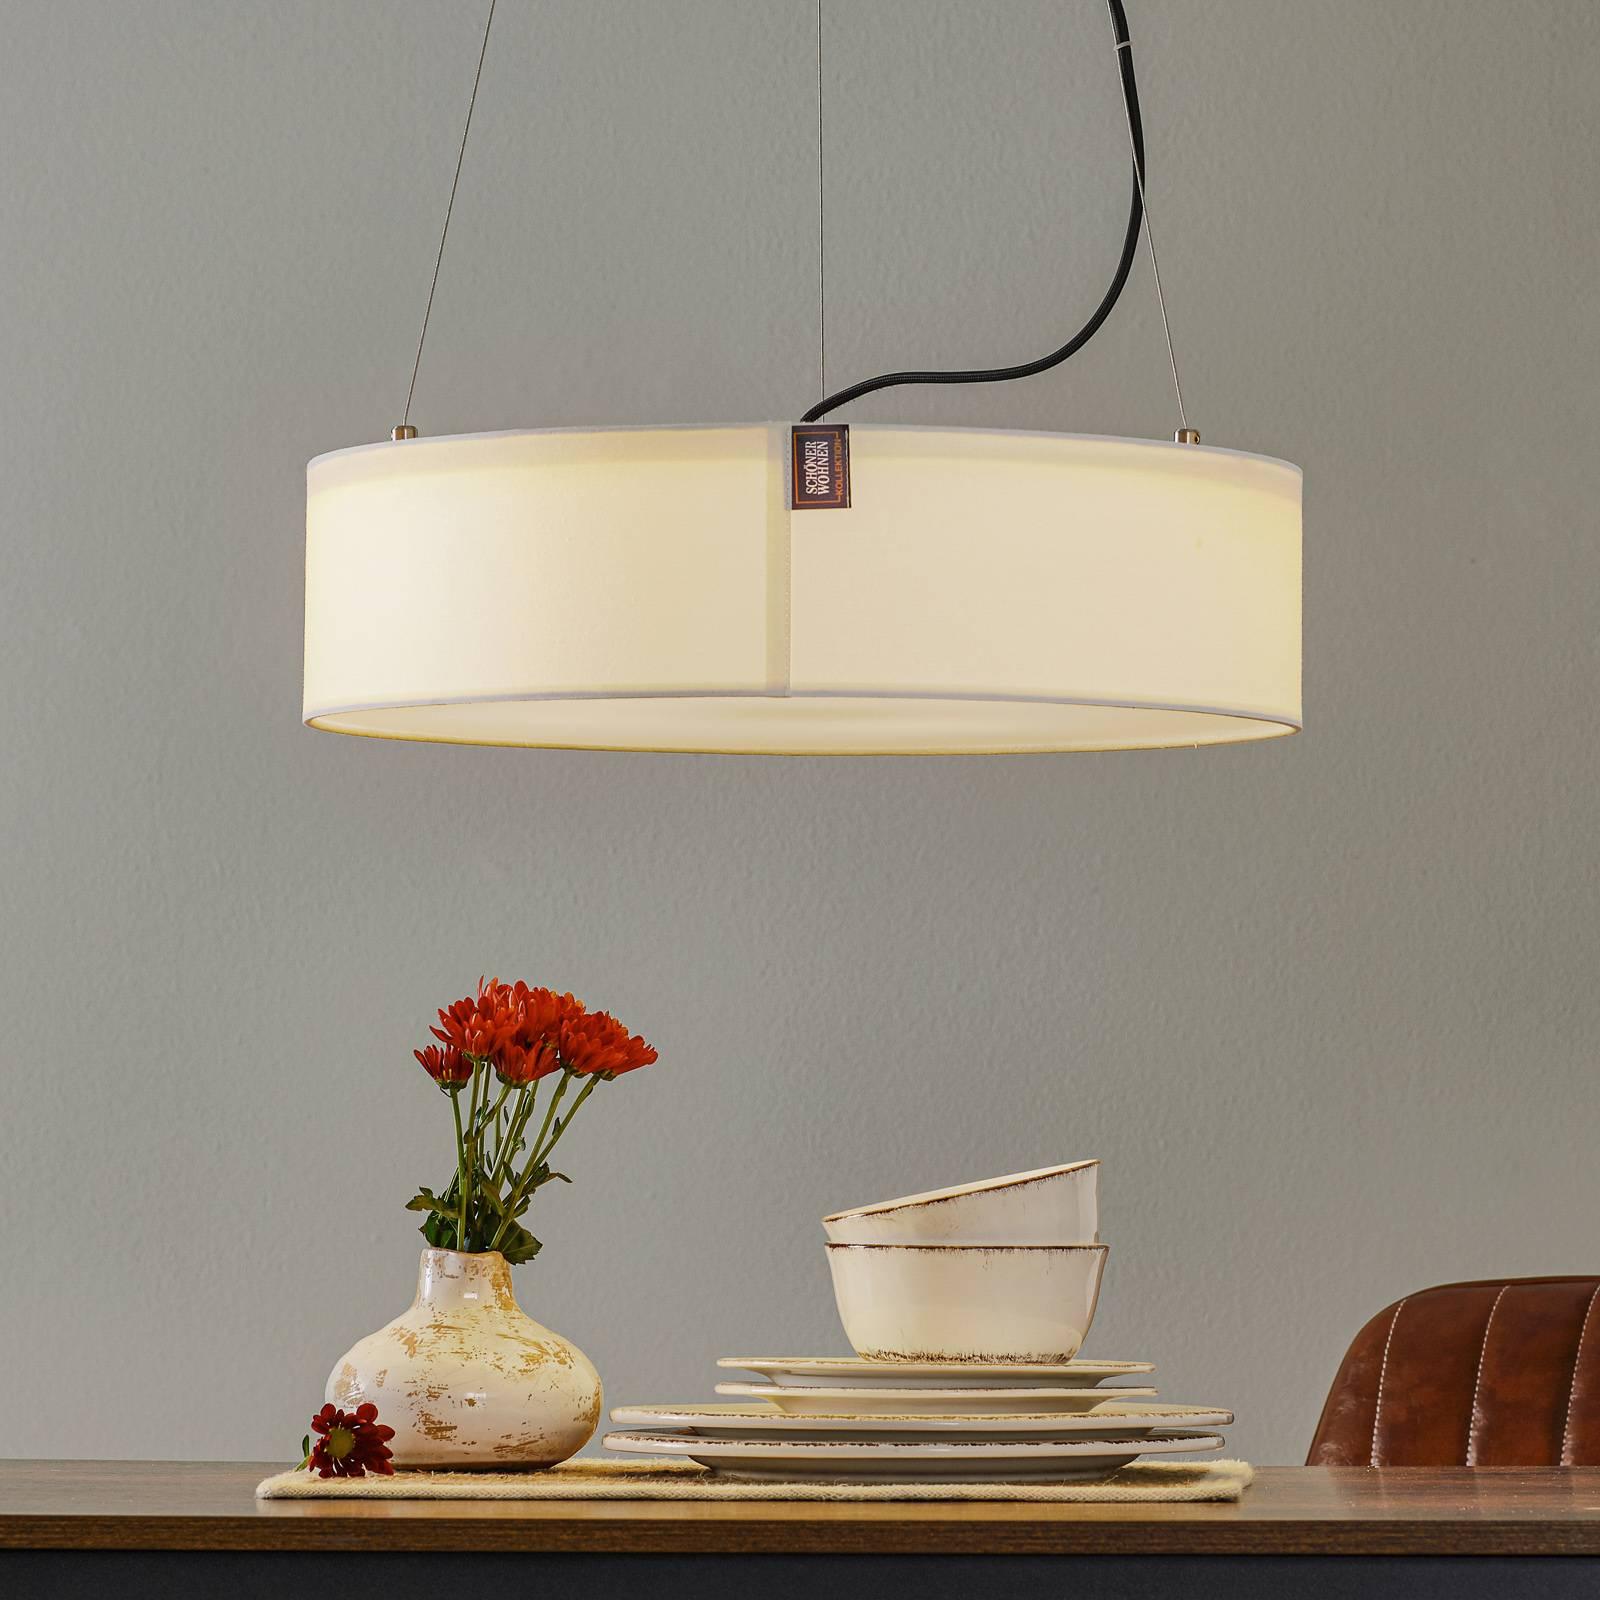 Schöner Wohnen Pina lampa wisząca biała